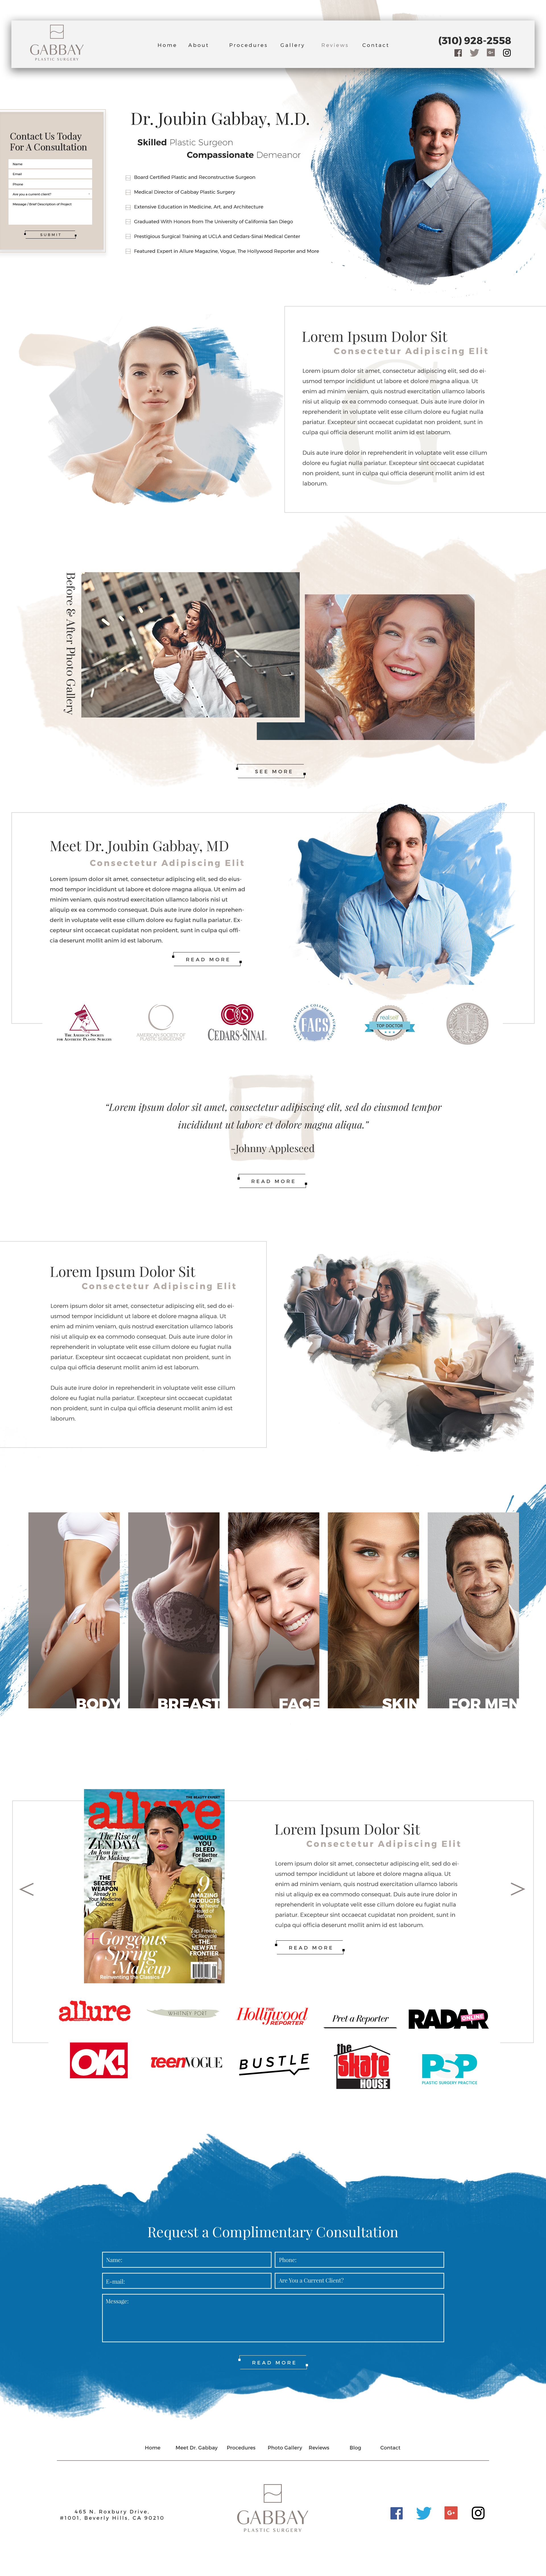 Web Design (Scorpion Internet Marketing): Dr. Gabbay- Plastic Surgery Website